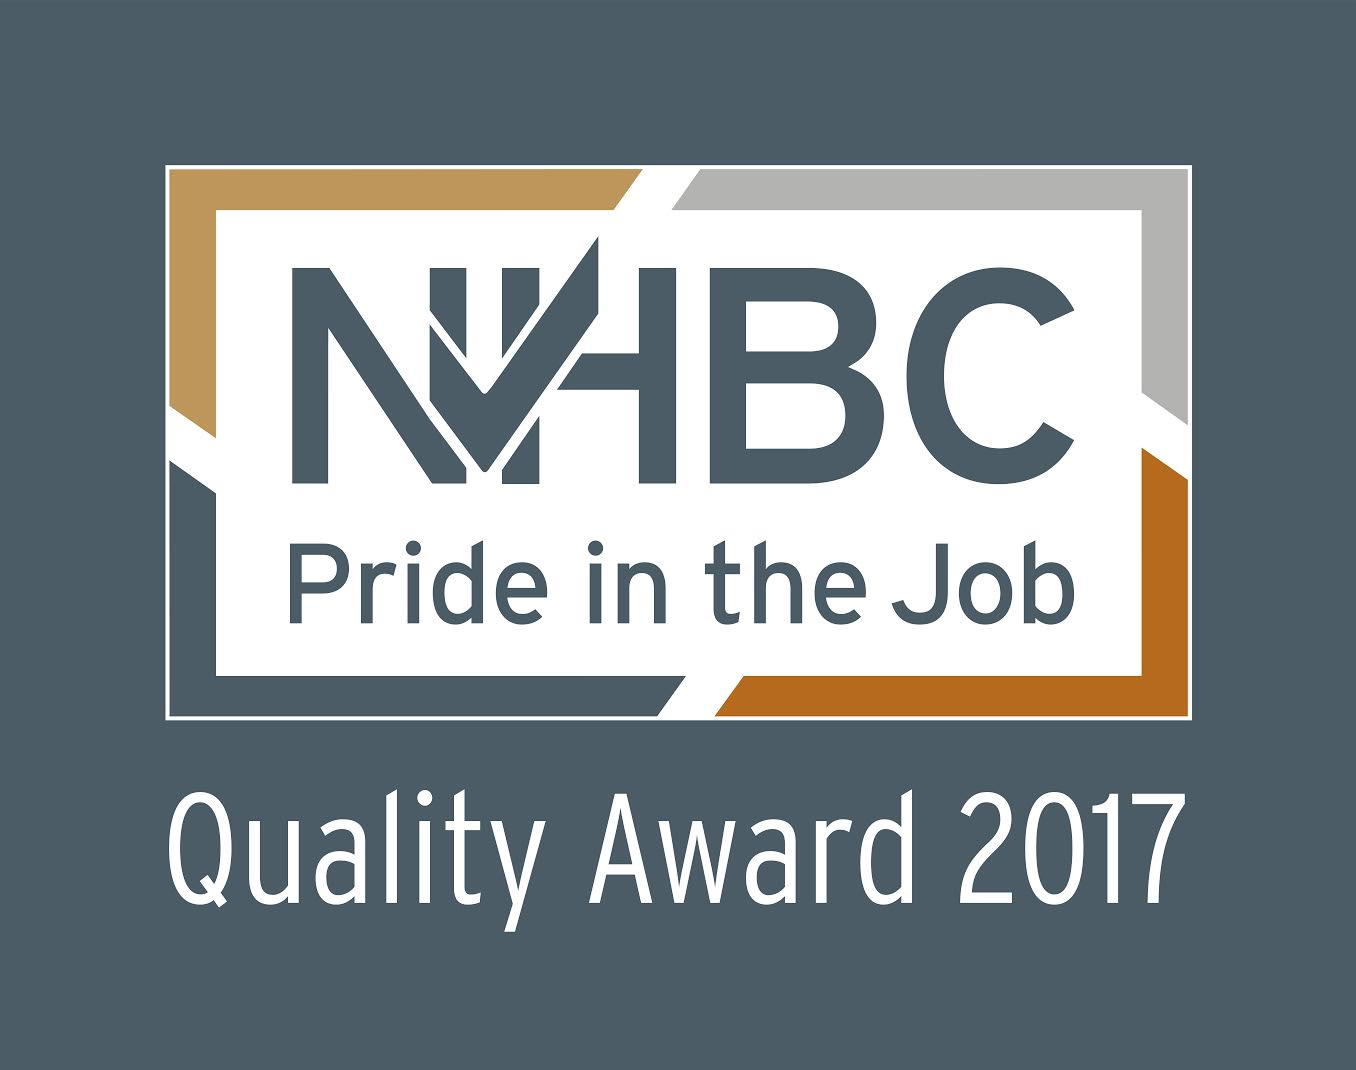 Quality Award 2017